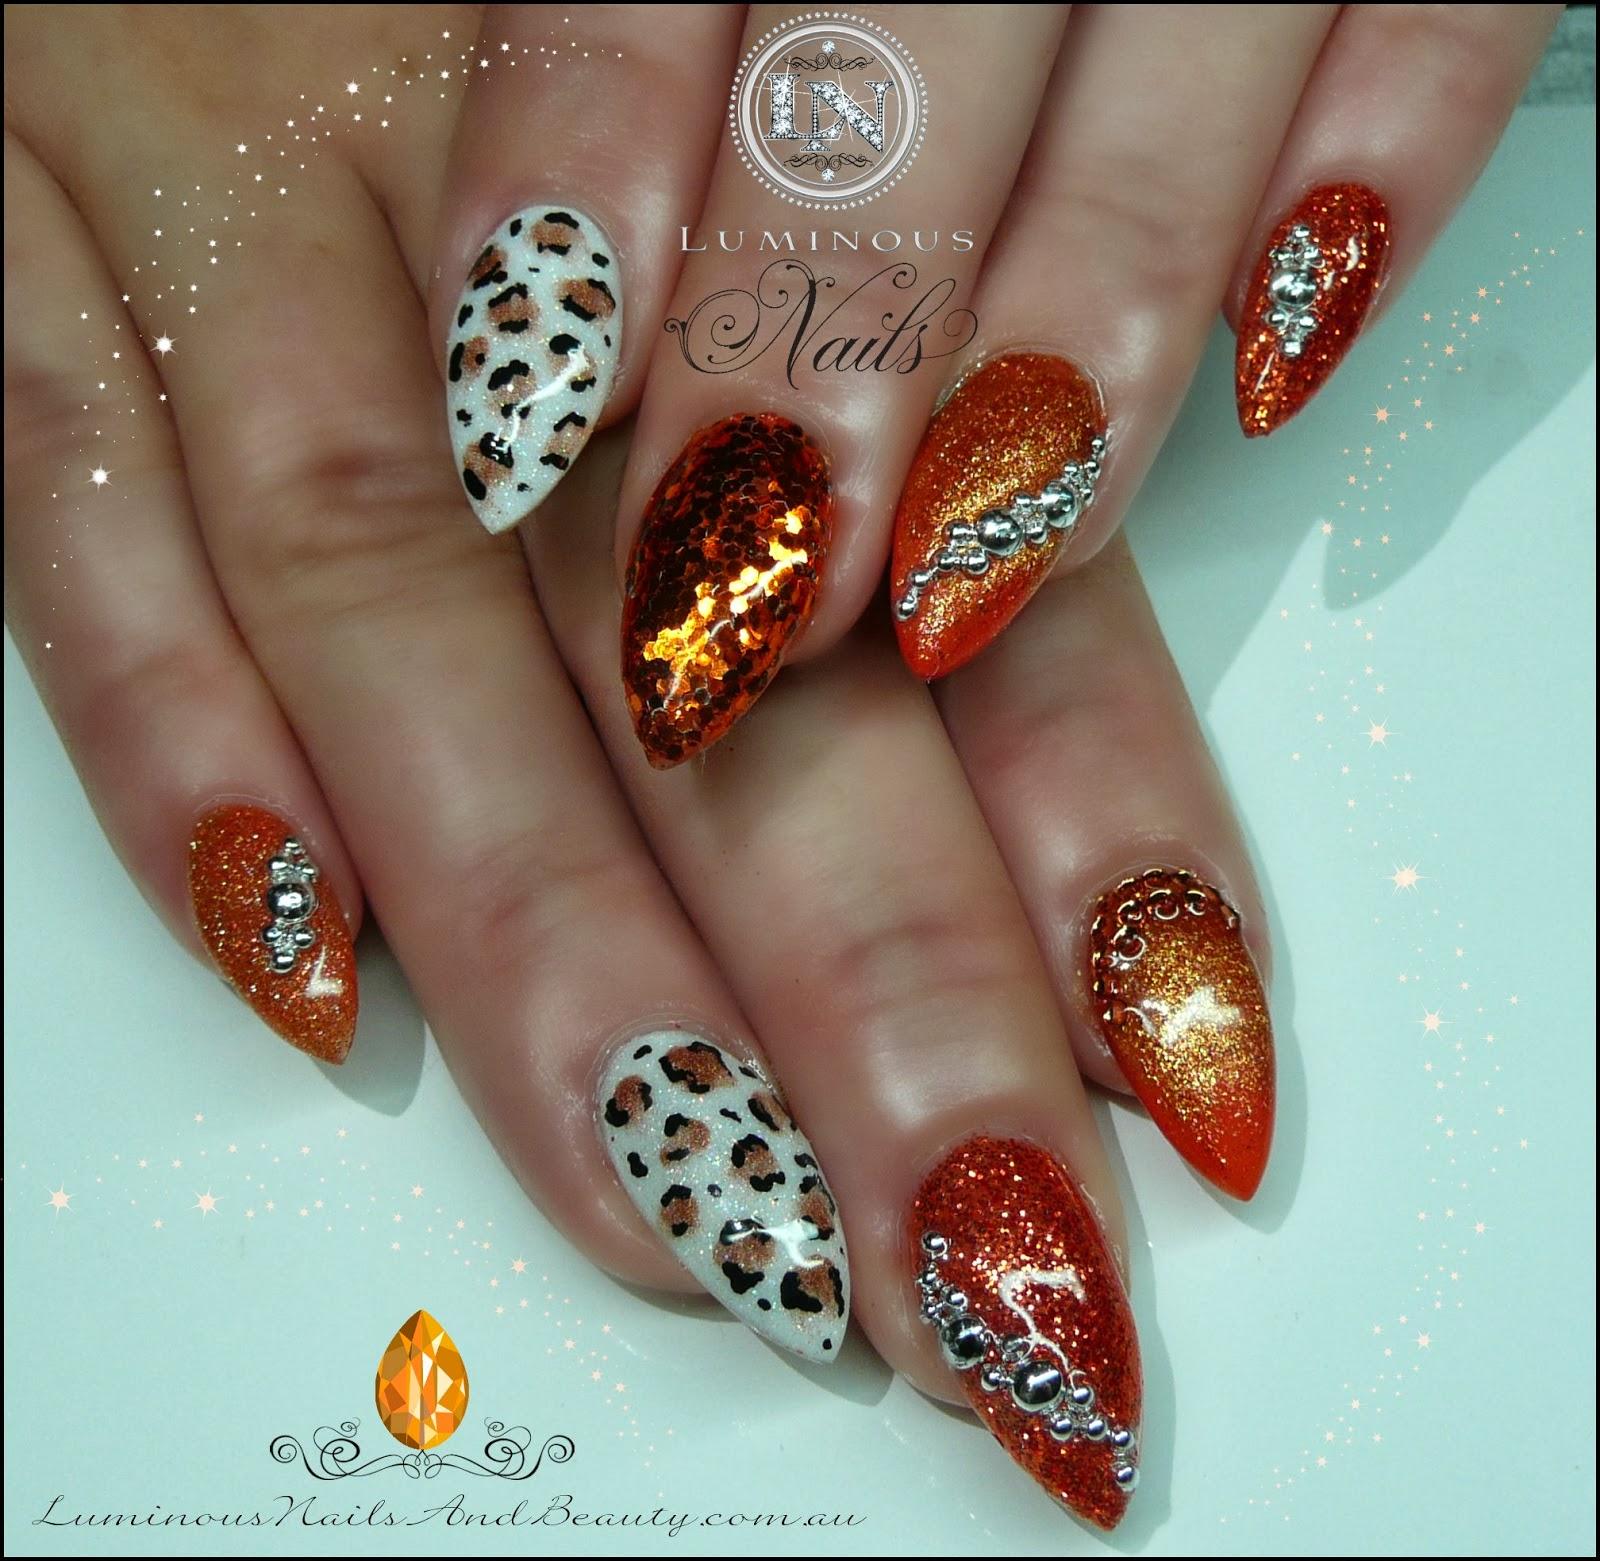 Luminous Nails: November 2013